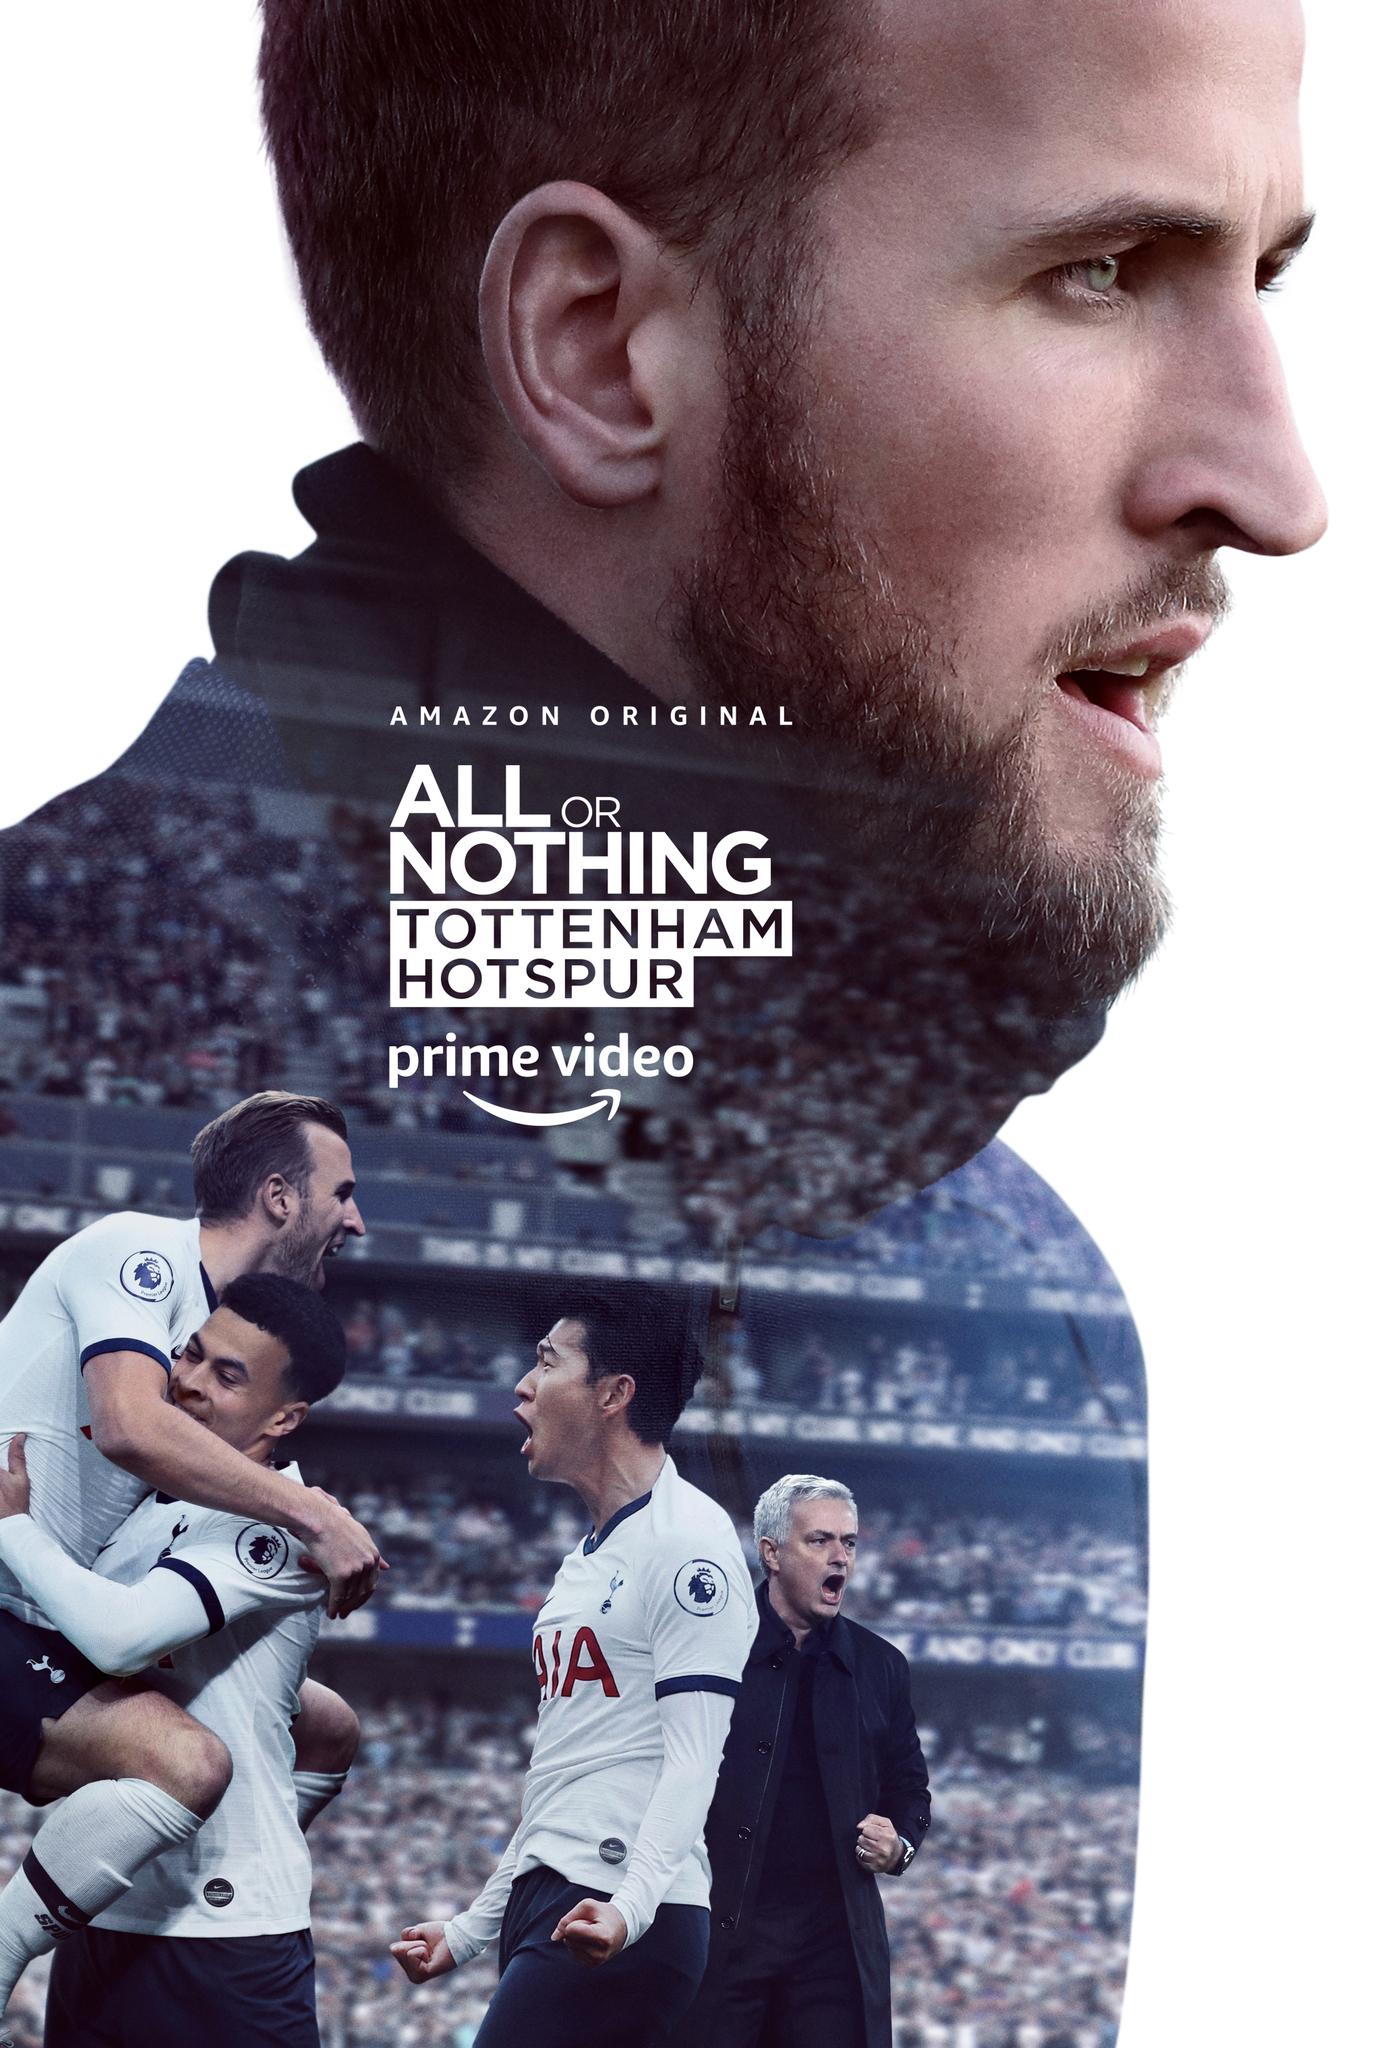 All or Nothing: Tottenham Hotspur (TV Series 2020– ) - IMDb